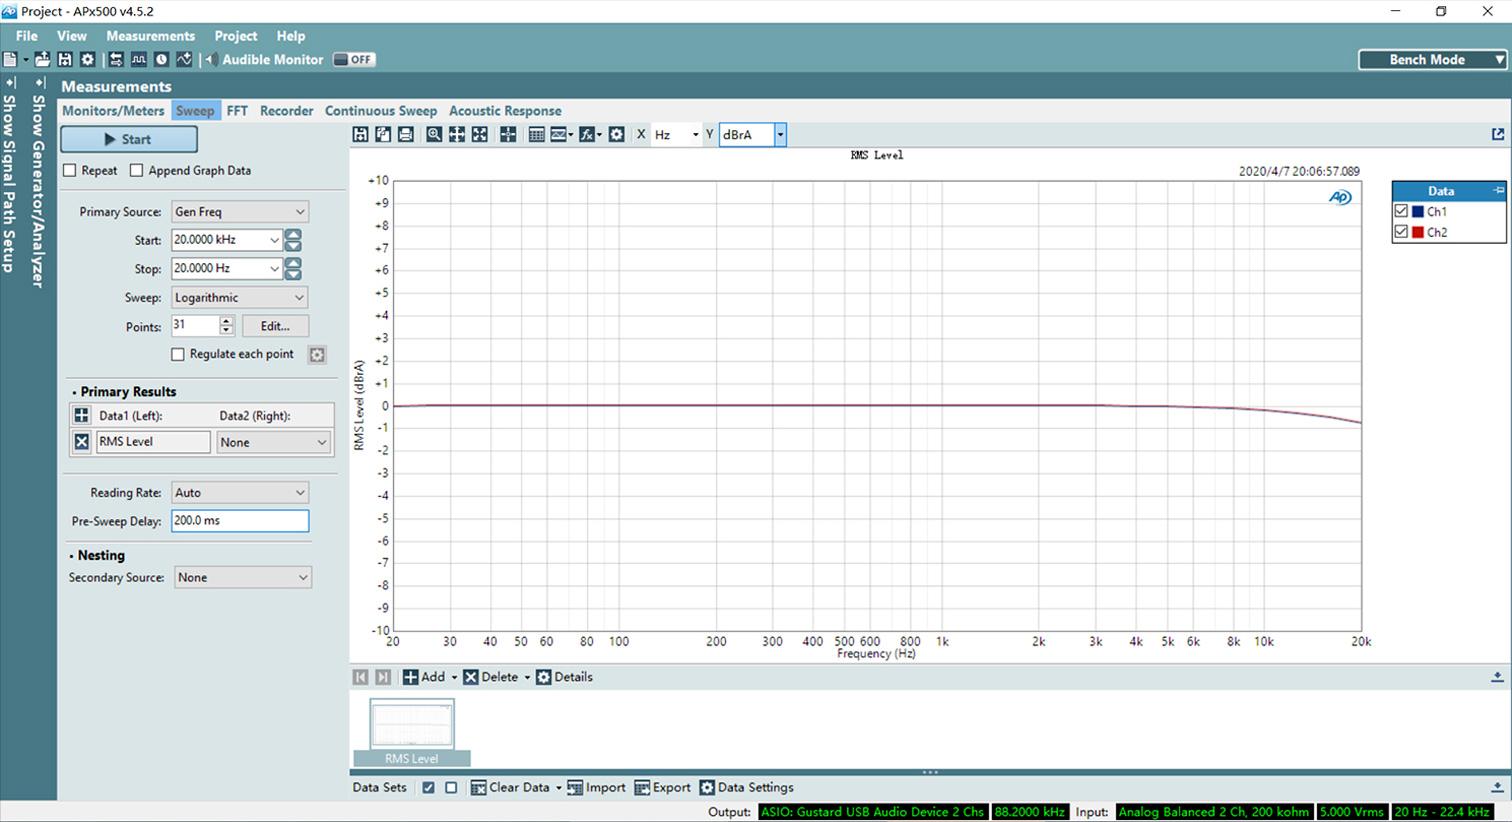 Gustard DAC-A18 DAC Symétrique AK4499 Accusilicon XMOS Bluetooth 5.0 32bit 768kHz DSD512